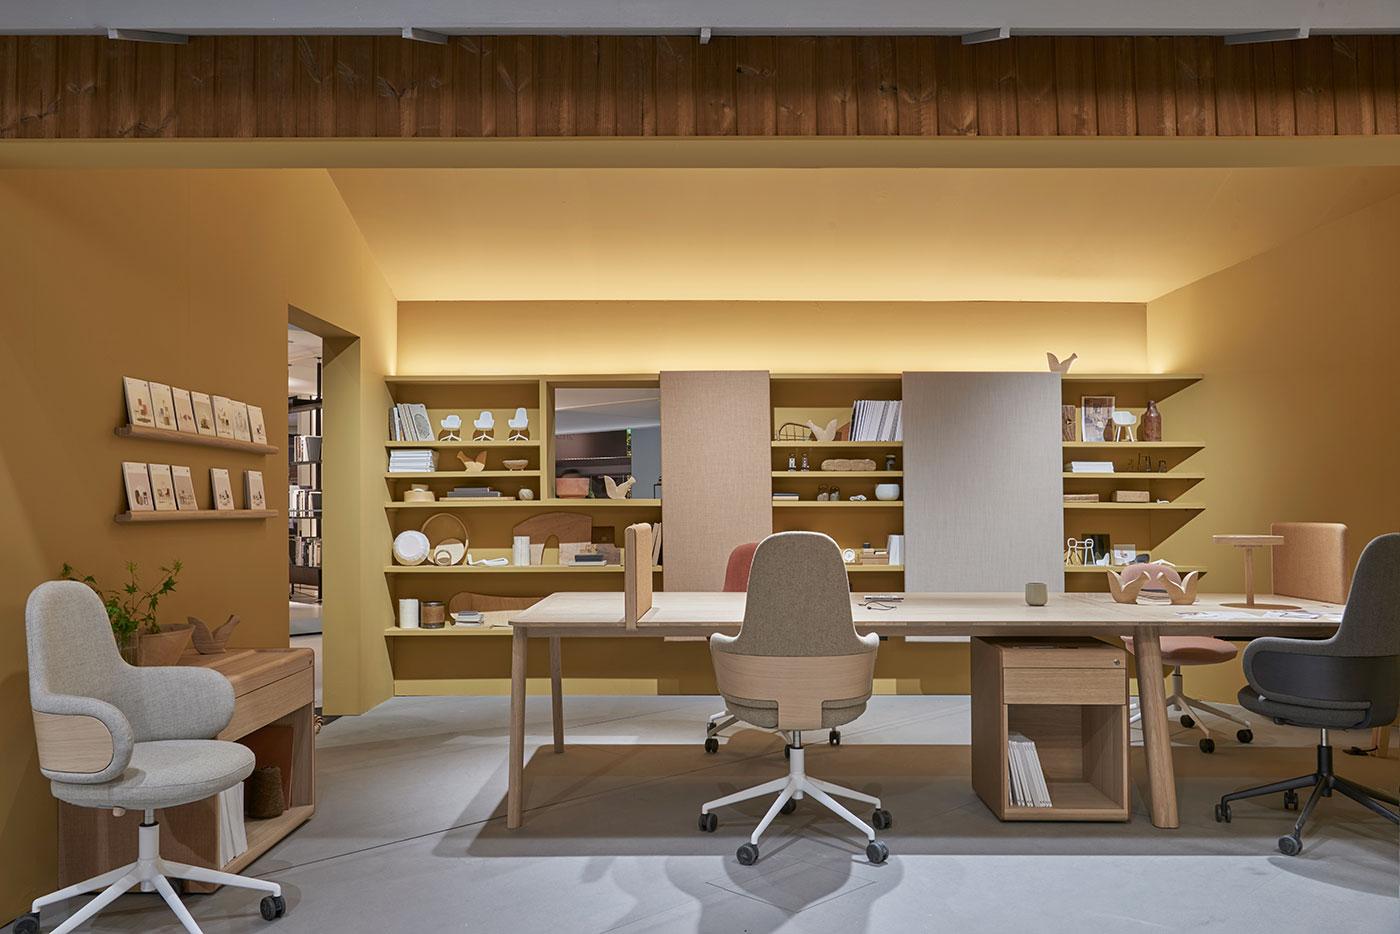 Stand-Design-Milano-Iratzoki-Lizaso-04